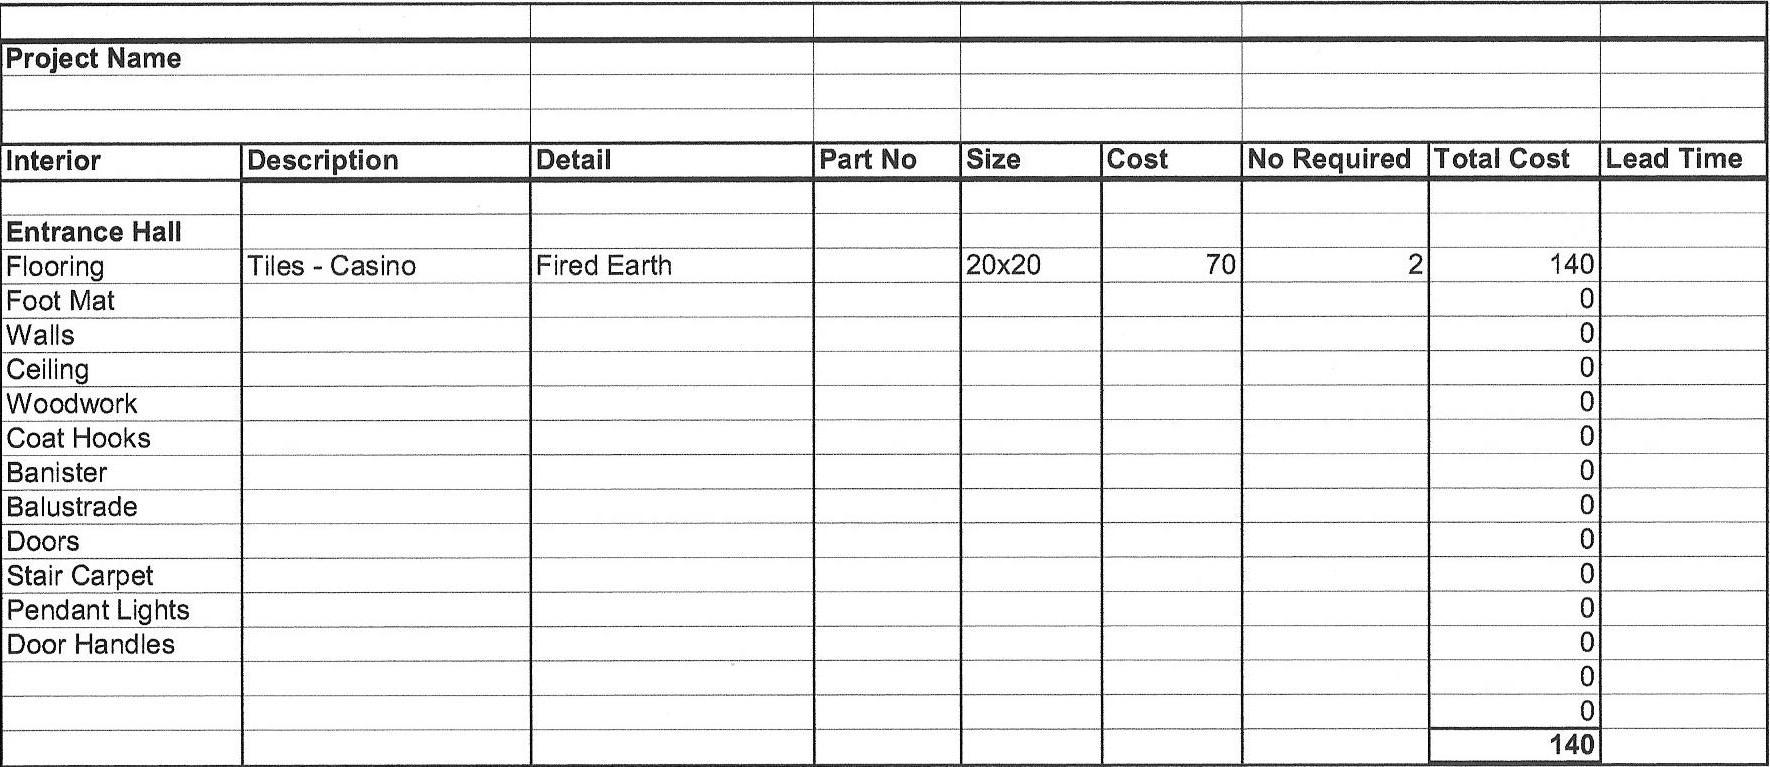 House Remodel Spreadsheet With Regard To Sample Homeenovation Budget Spreadsheet Bathroomemodel Checklist